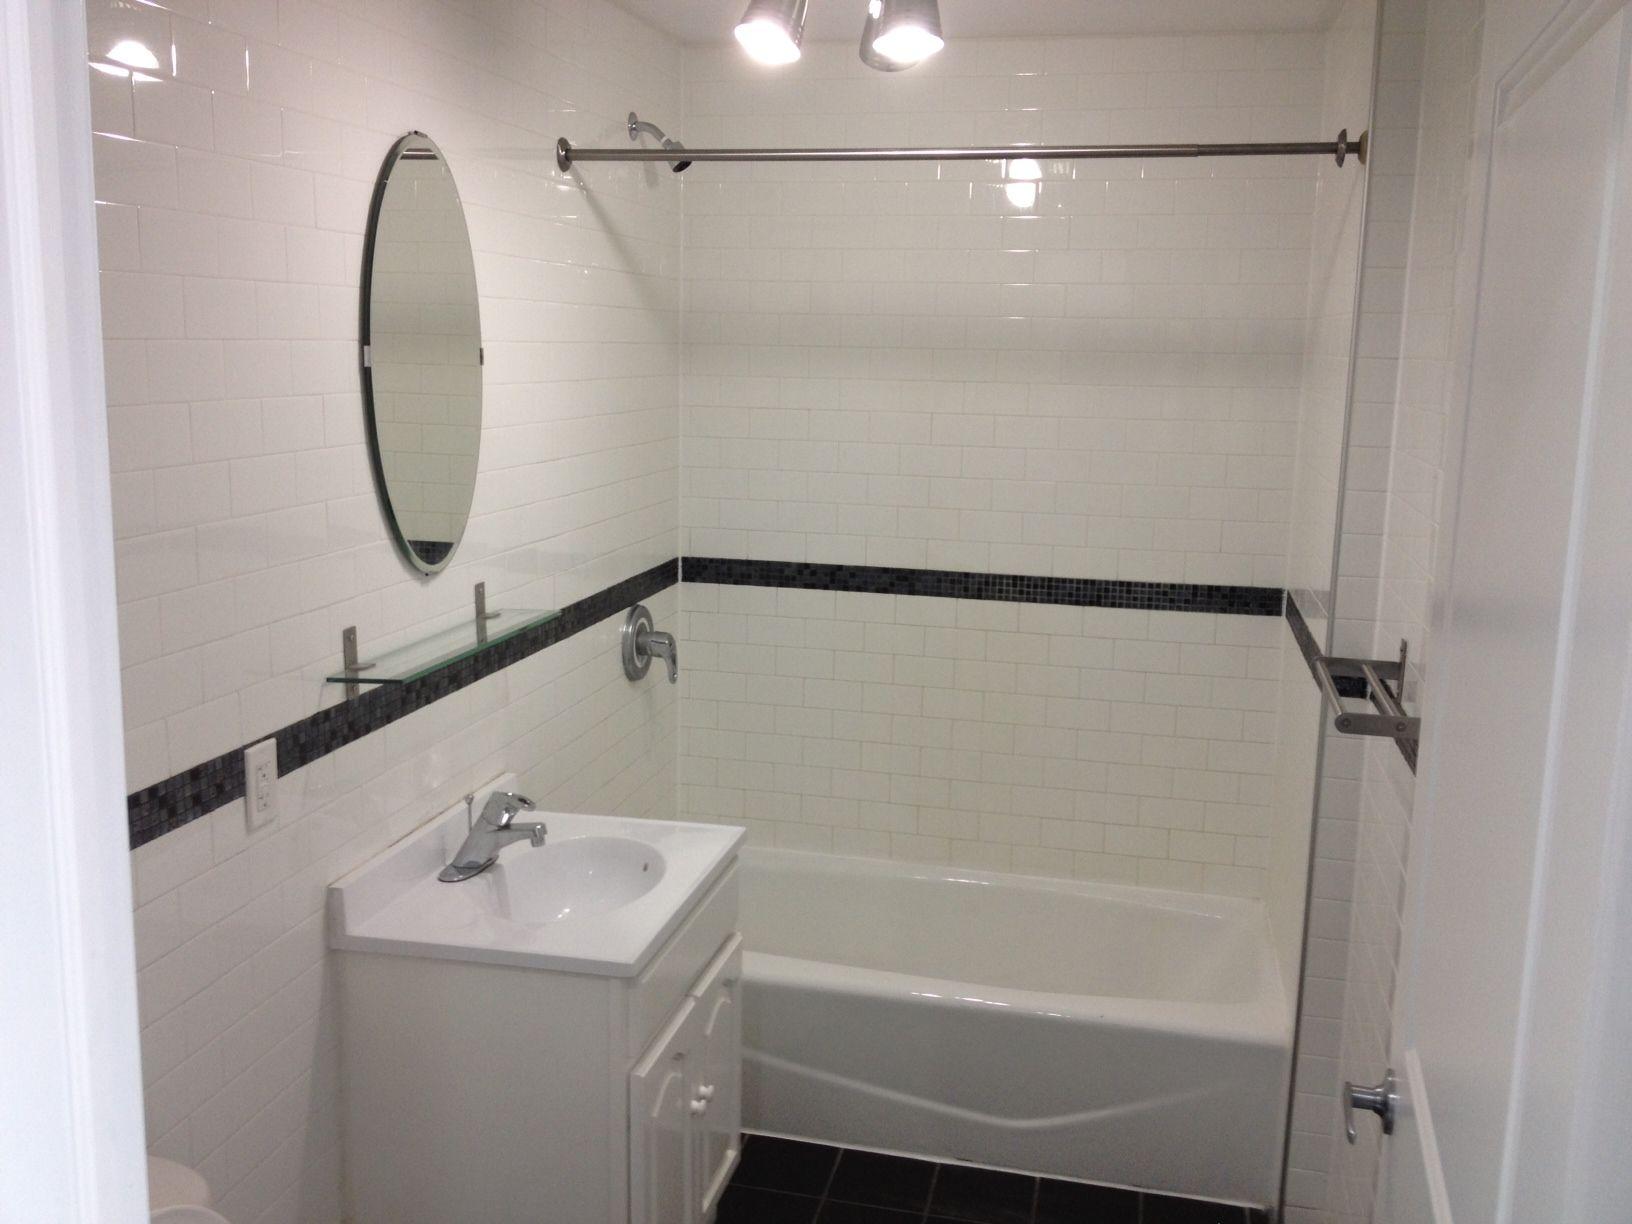 Bathroom design with subway tiles